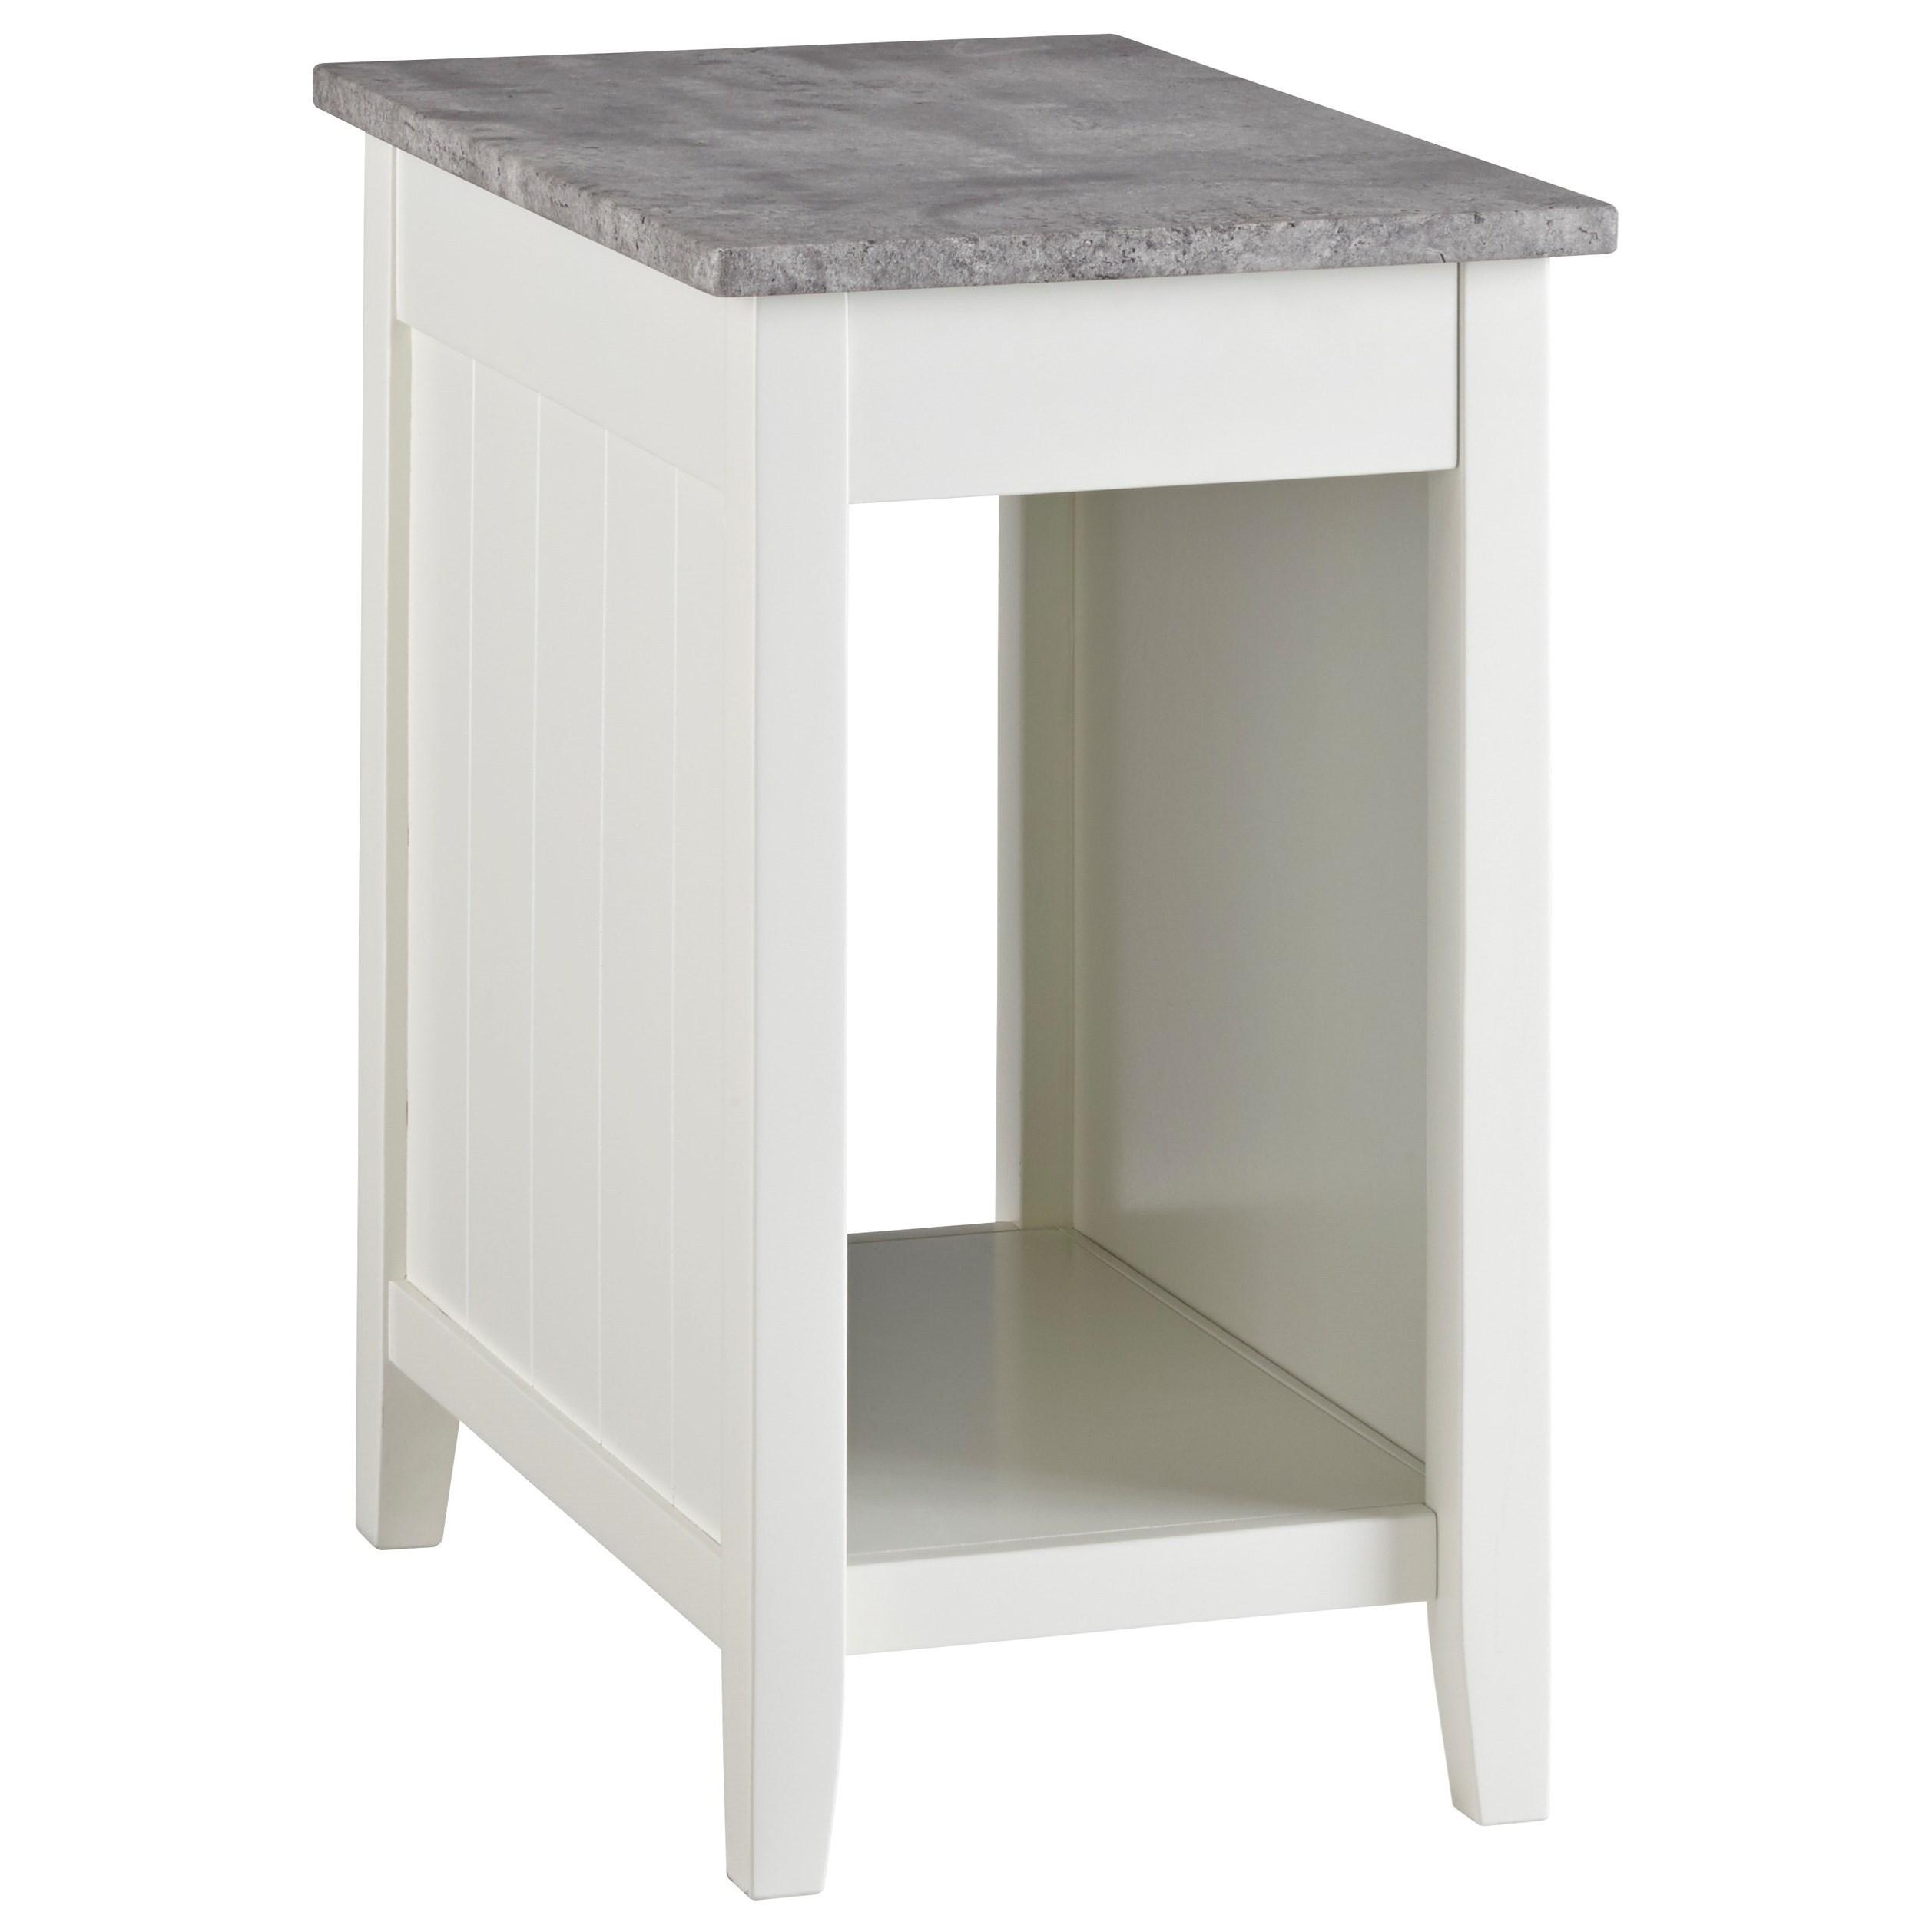 Signature Design By Ashley Diamenton White Paint Chair Side End Table With Faux Concrete Top